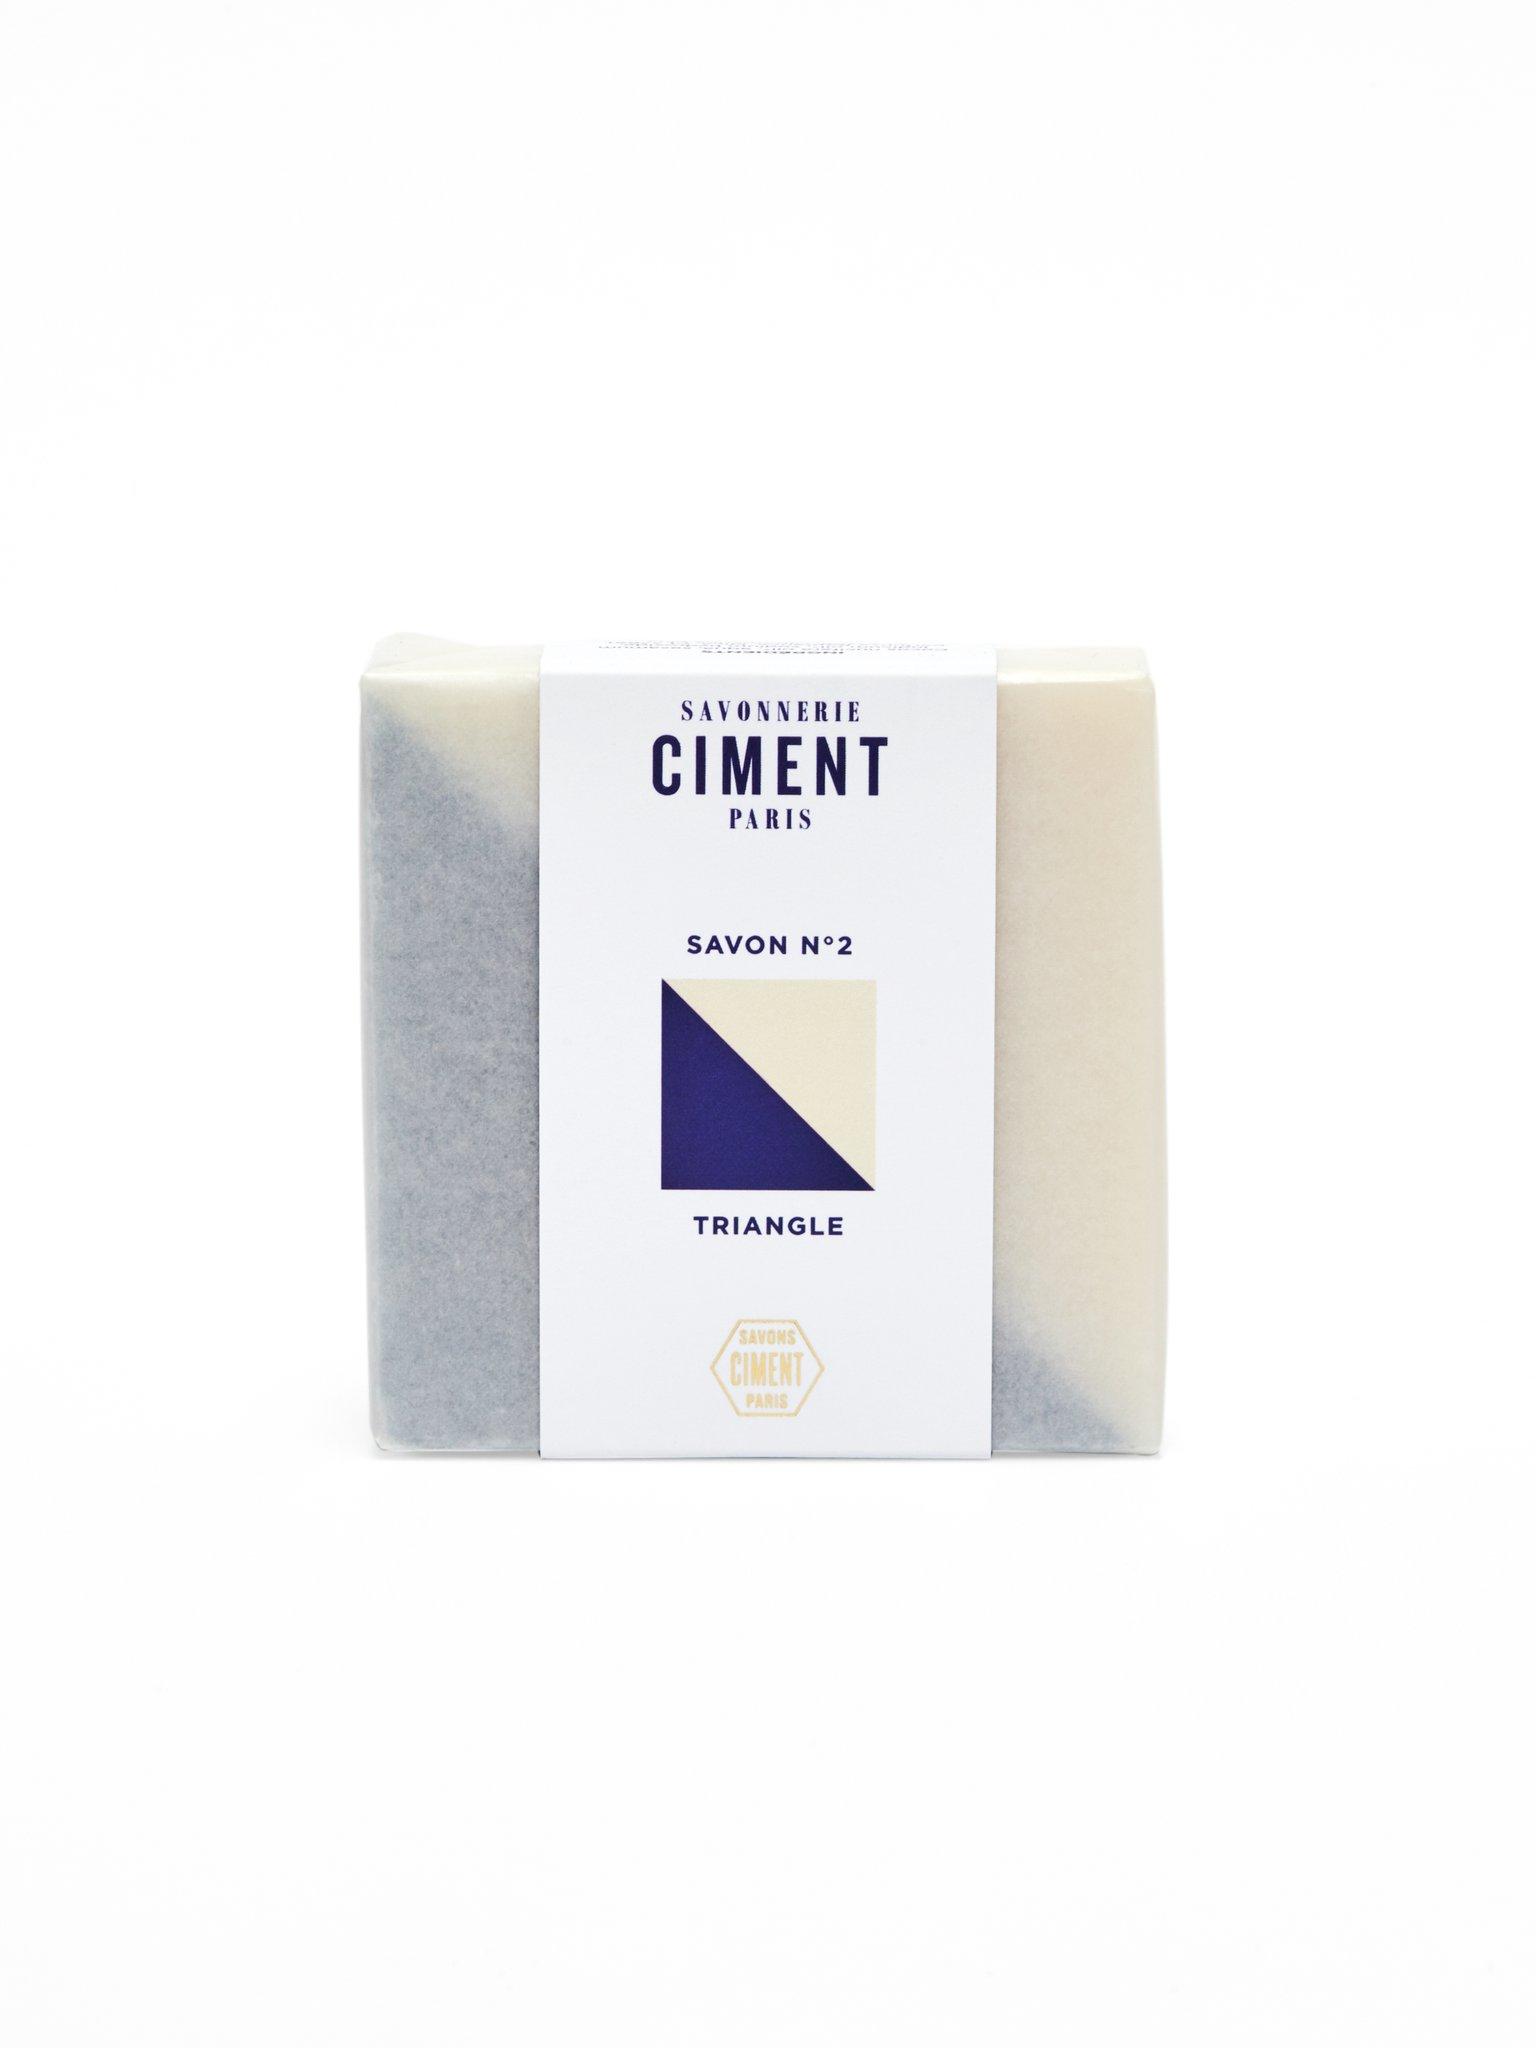 Ciment2 (2)